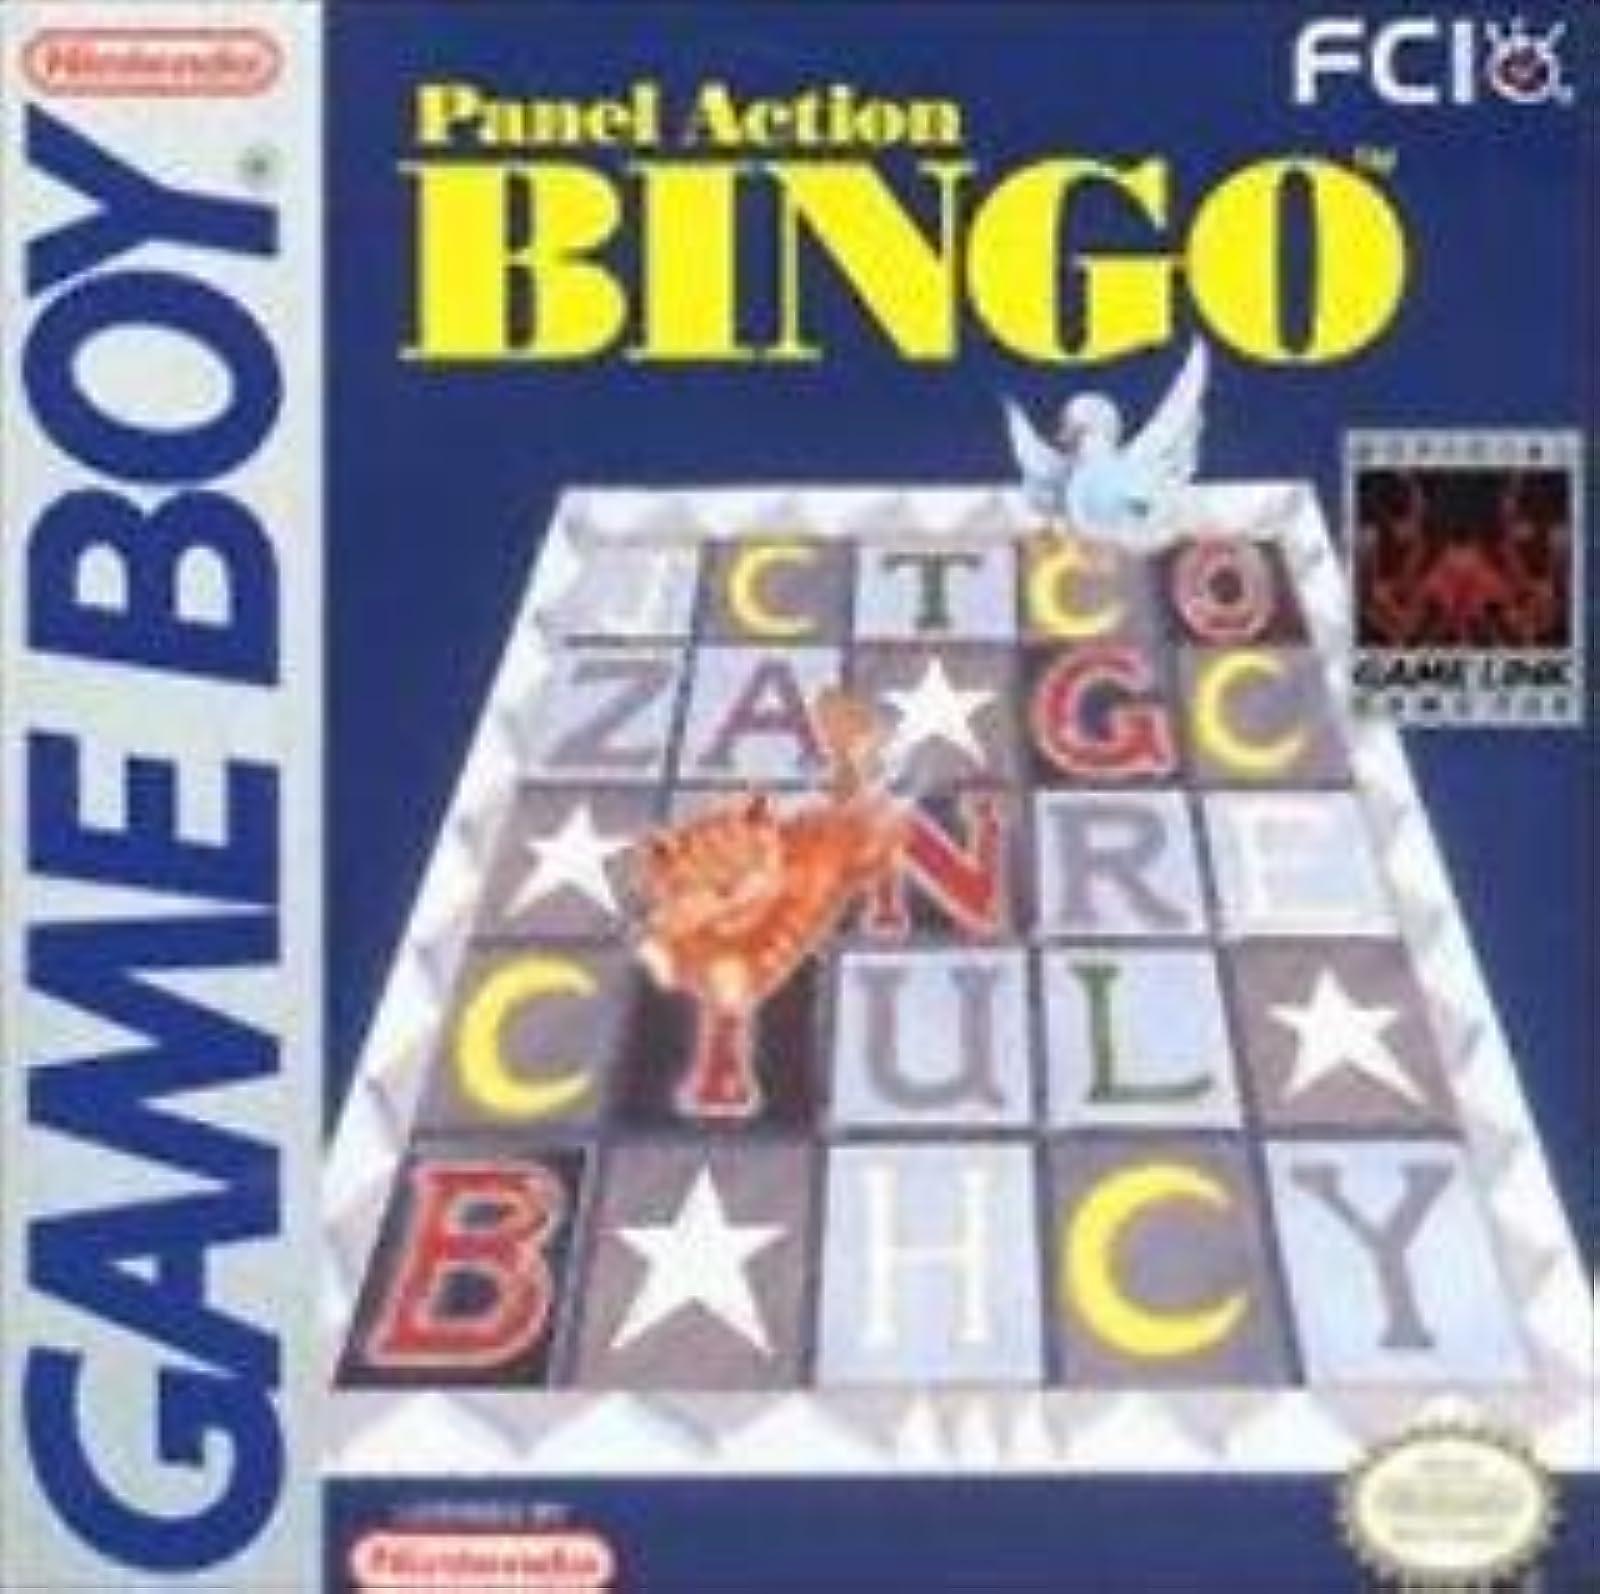 Panel Action Bingo For Arcade On Gameboy